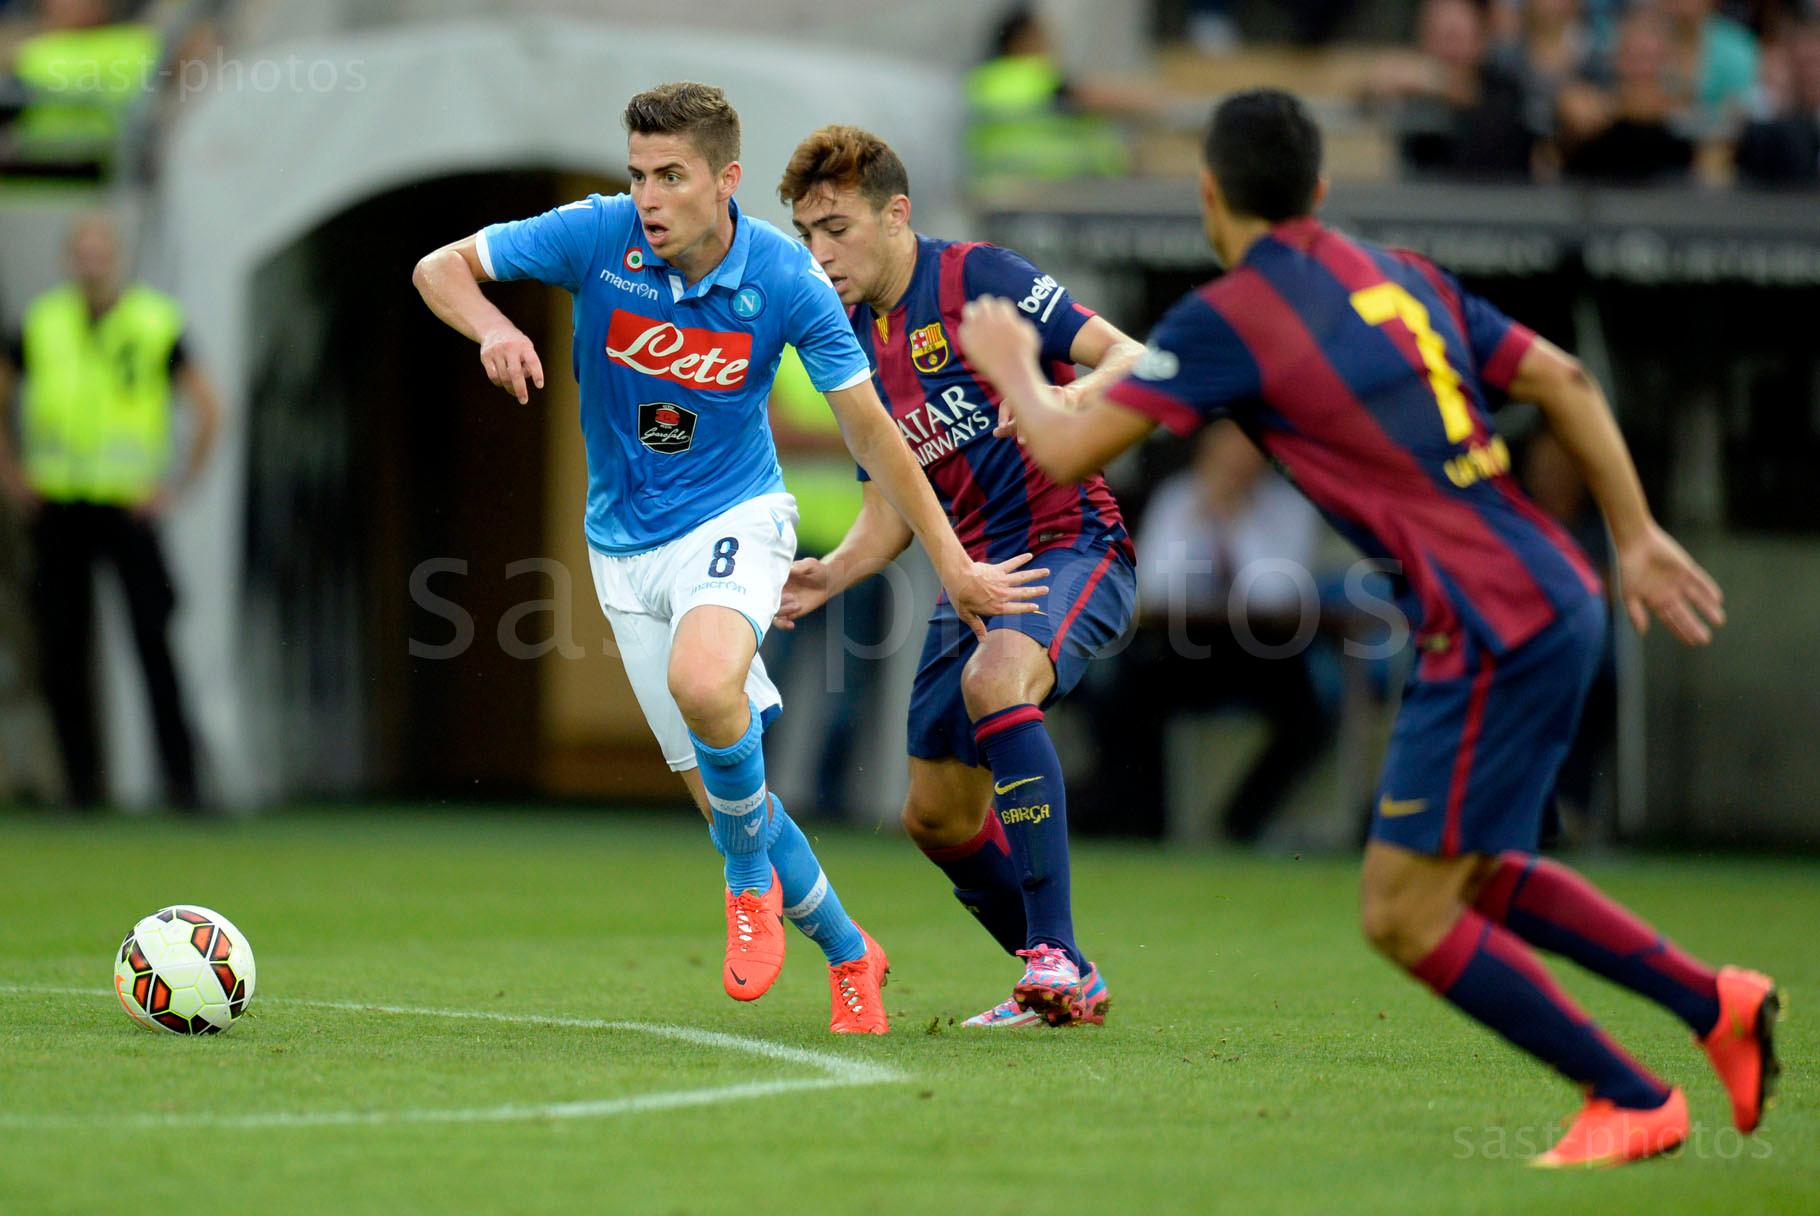 Jorge Luiz Frello Jorginho (Napoli) gegen Jordi Alba Ramos (M. Barcelona) und Pedro Rodriguez Ledesma (Barcelona)